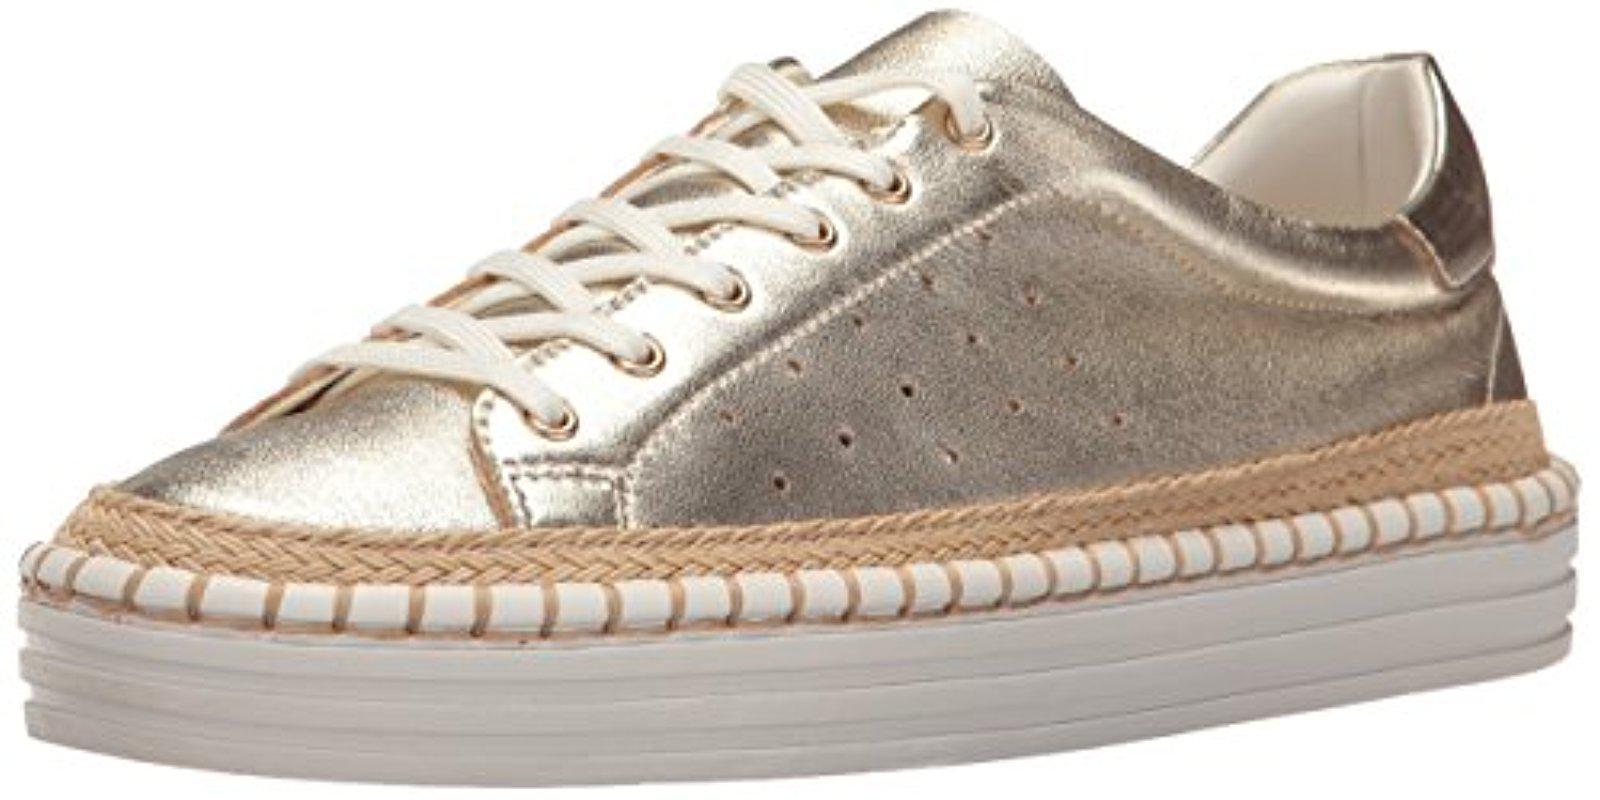 3ad0e0774a22 Lyst - Sam Edelman Kavi Sneaker in Metallic